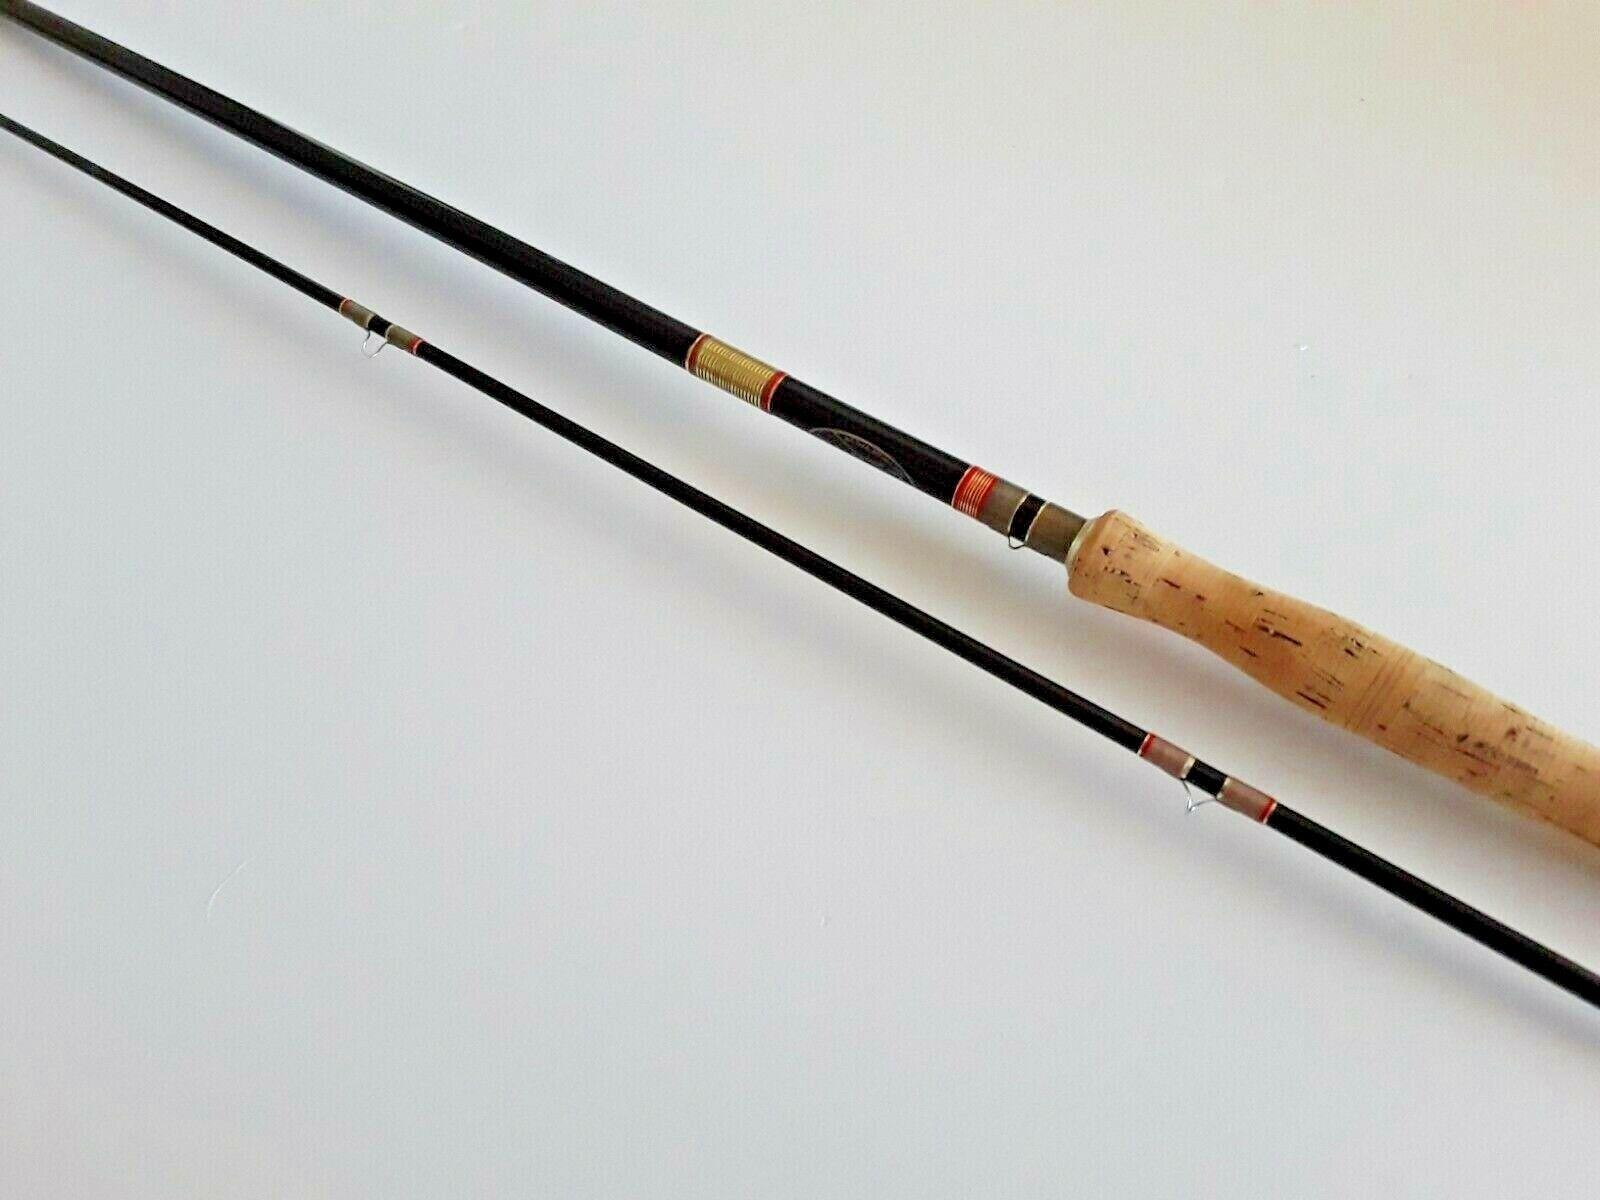 Vintage J.C.  Higgins Fly Fishing Rod '6   save on clearance